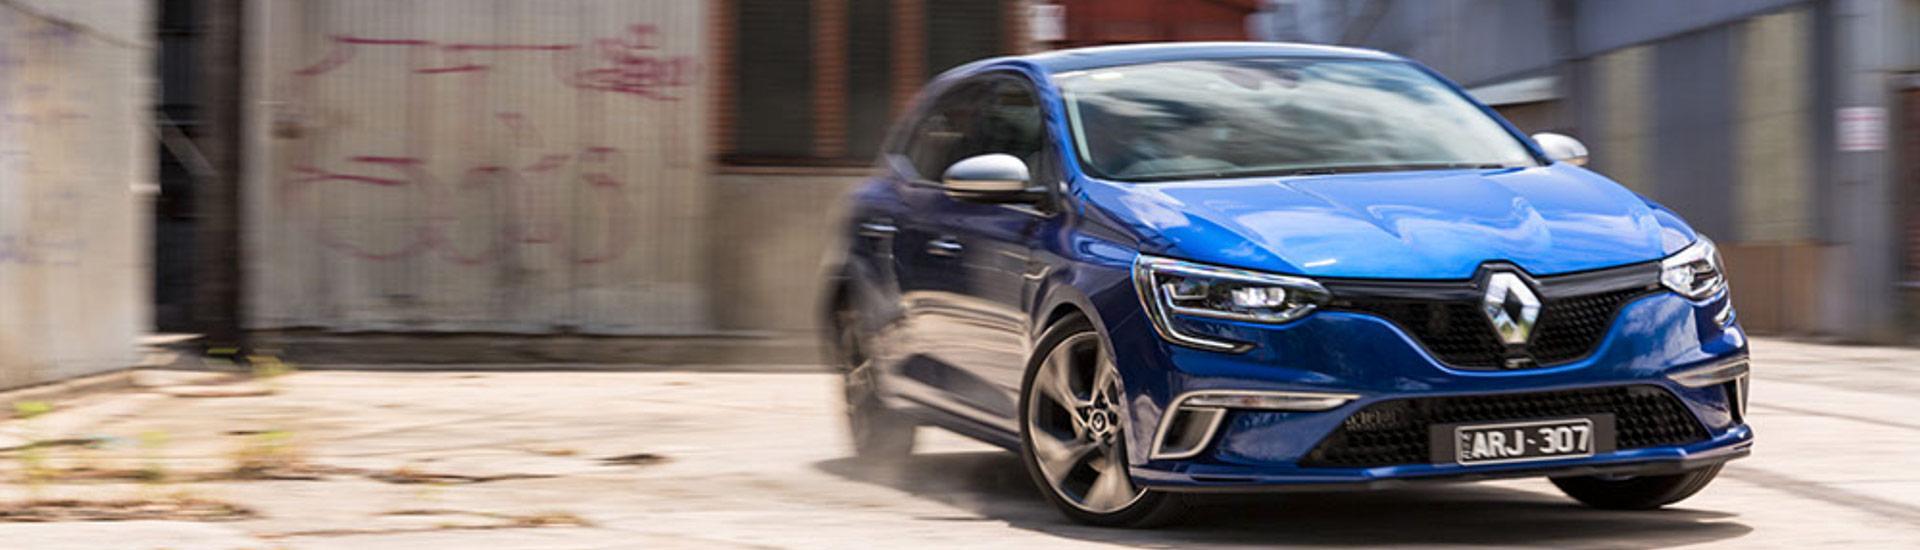 New Renault Megane Hatch Cars For Sale - carsales.com.au